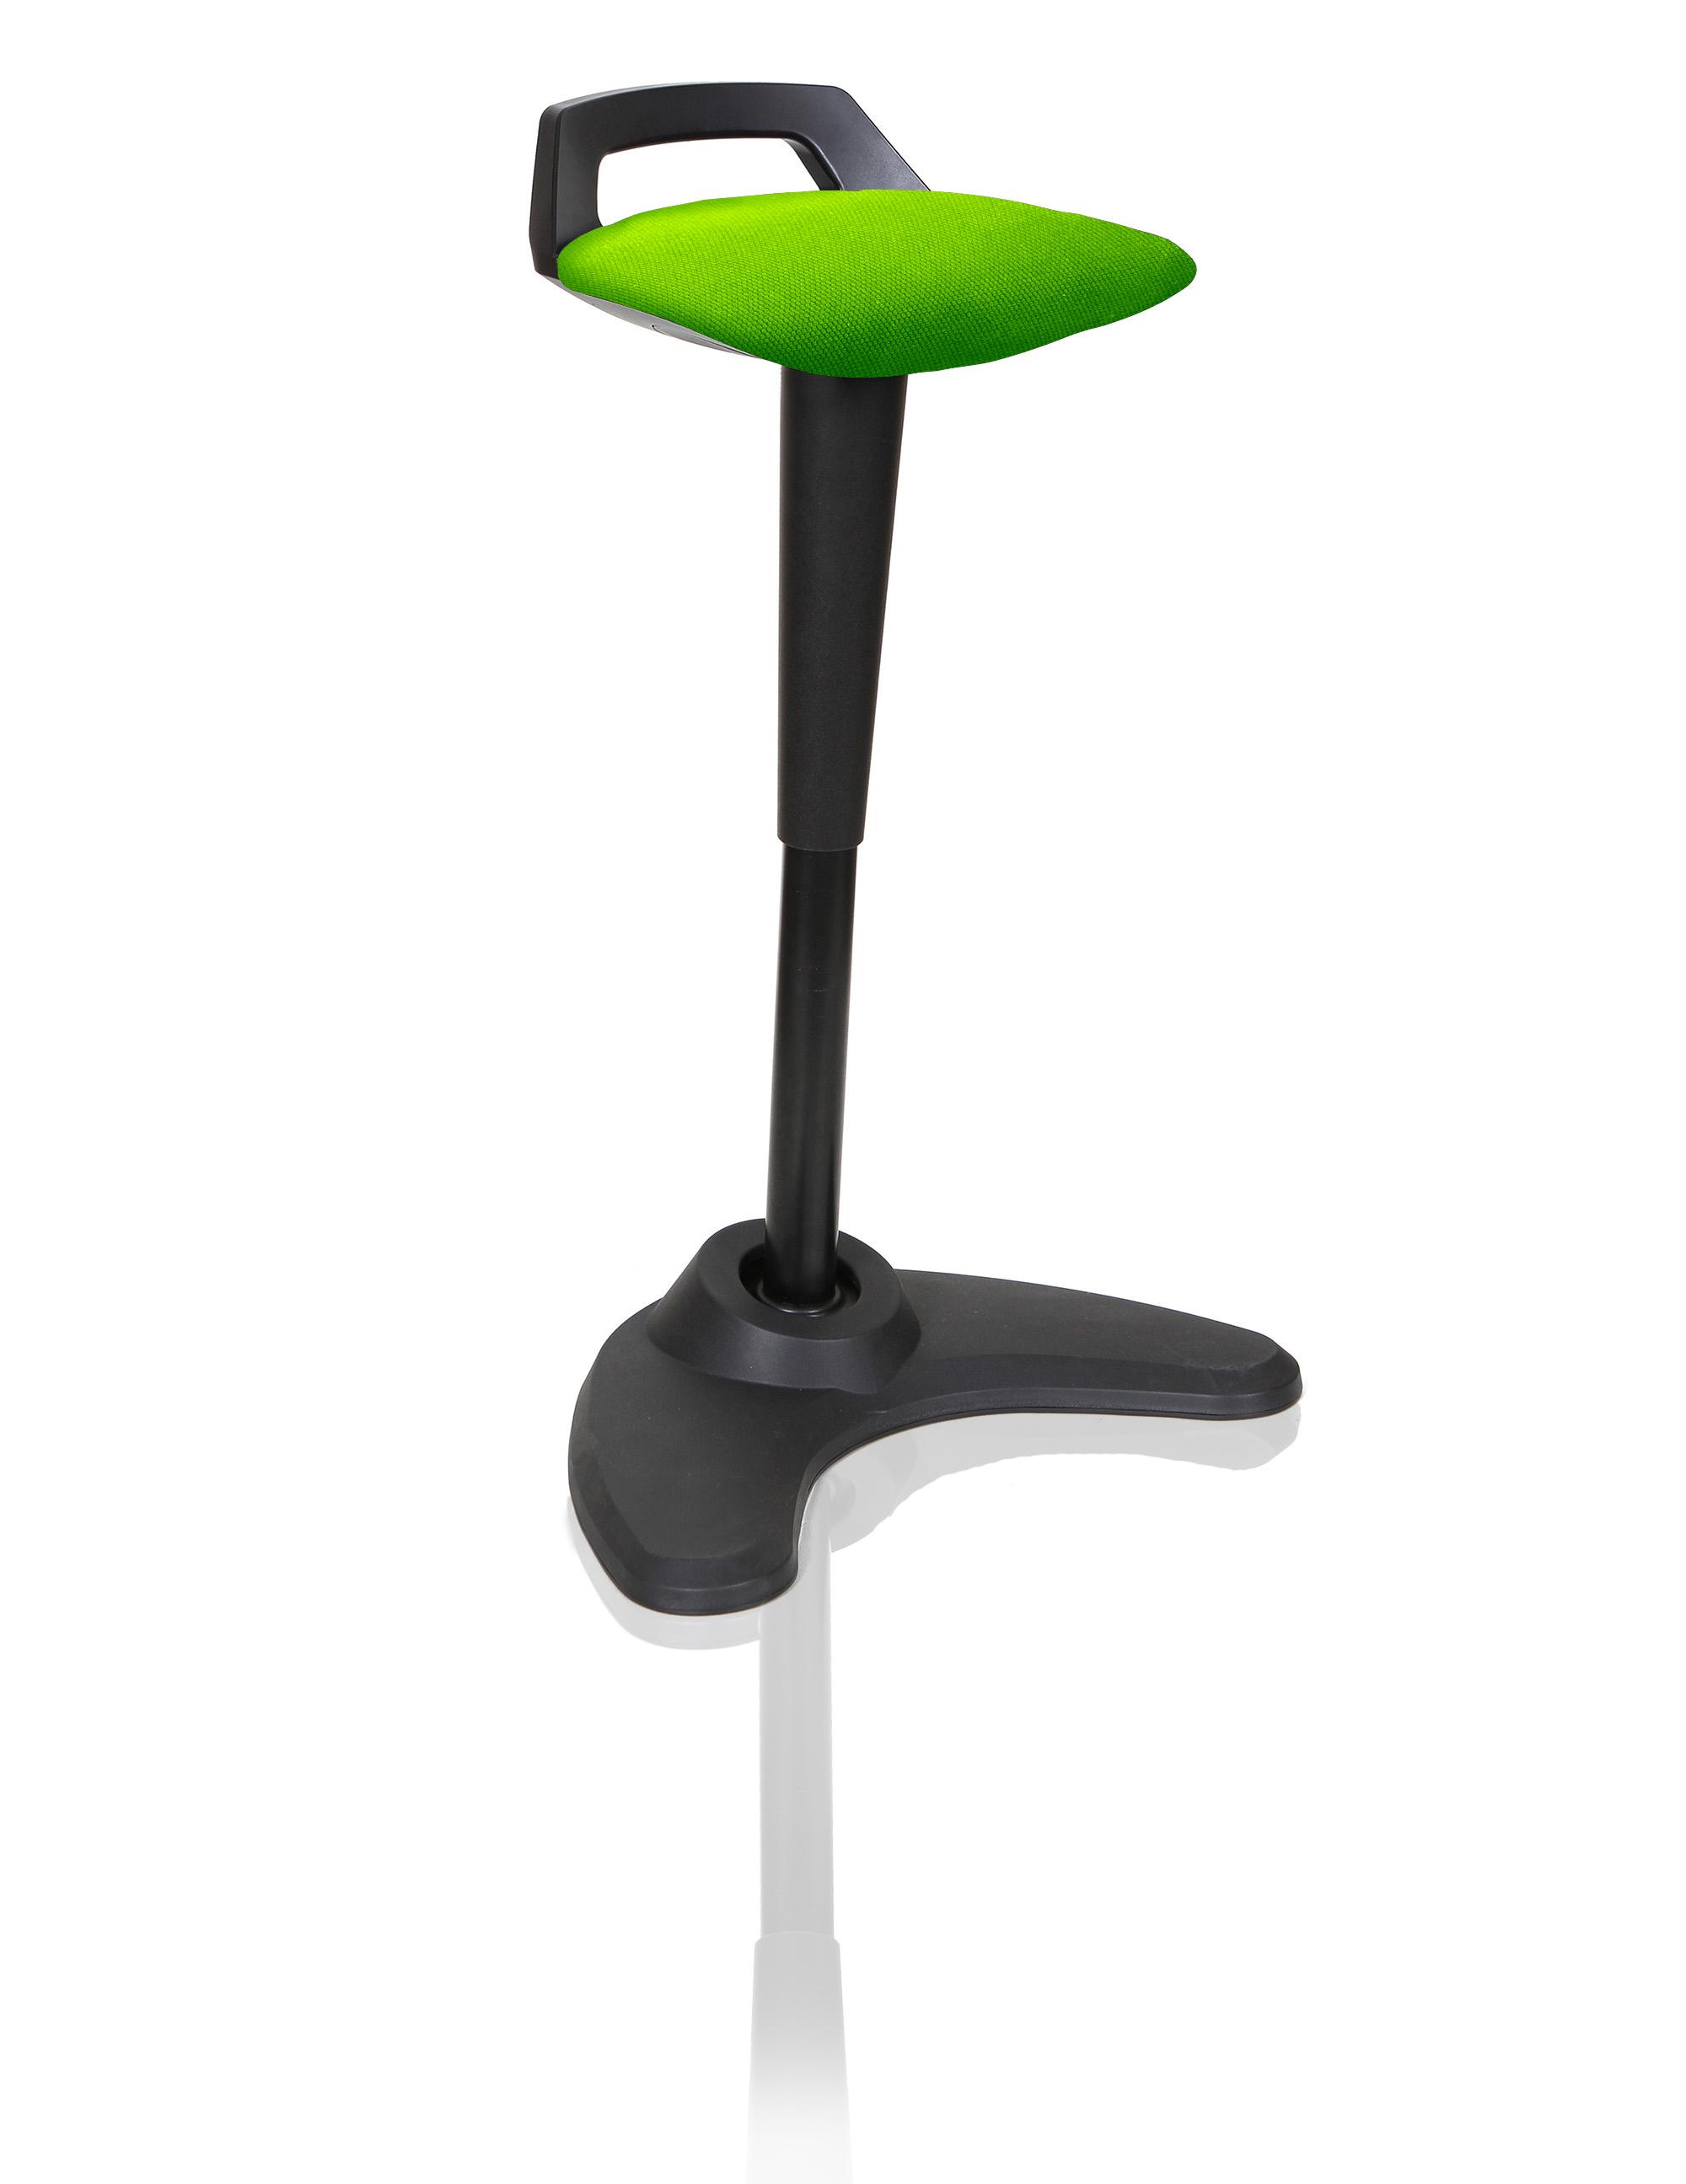 Spry Stool Black Frame Bespoke Seat Myrrh Green KCUP1209